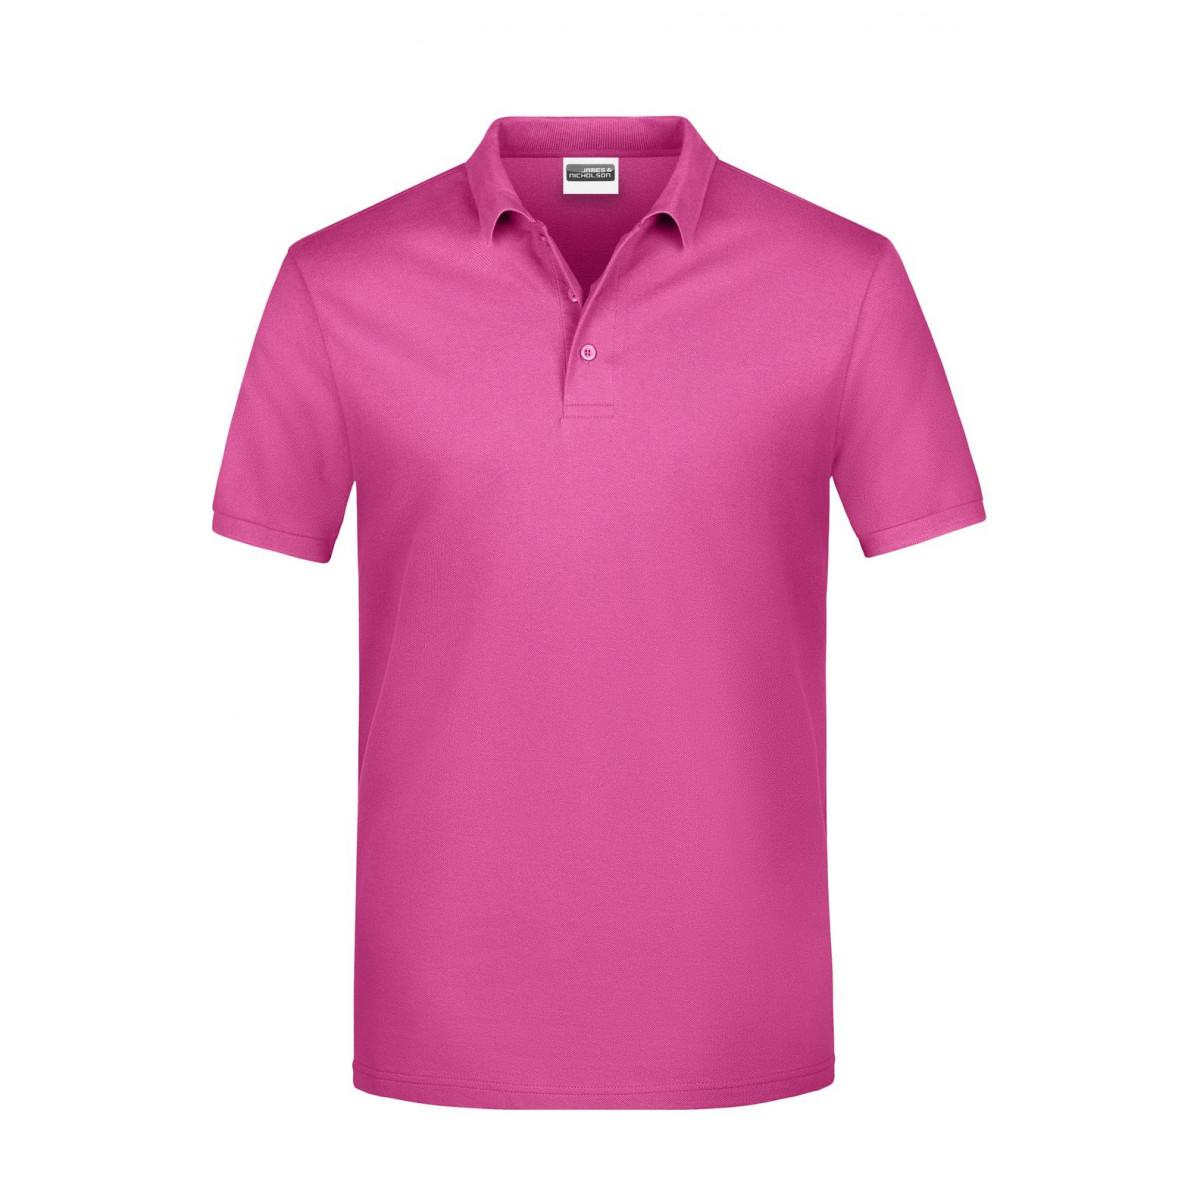 Рубашка поло мужская JN792 Basic Polo Man - Розовый